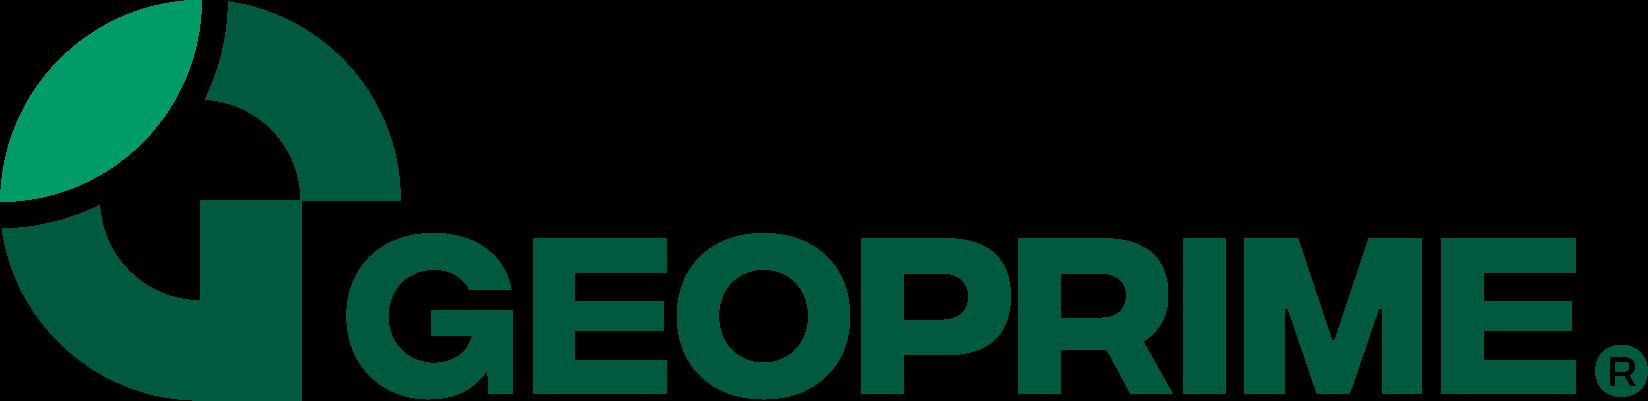 Geoprime logo